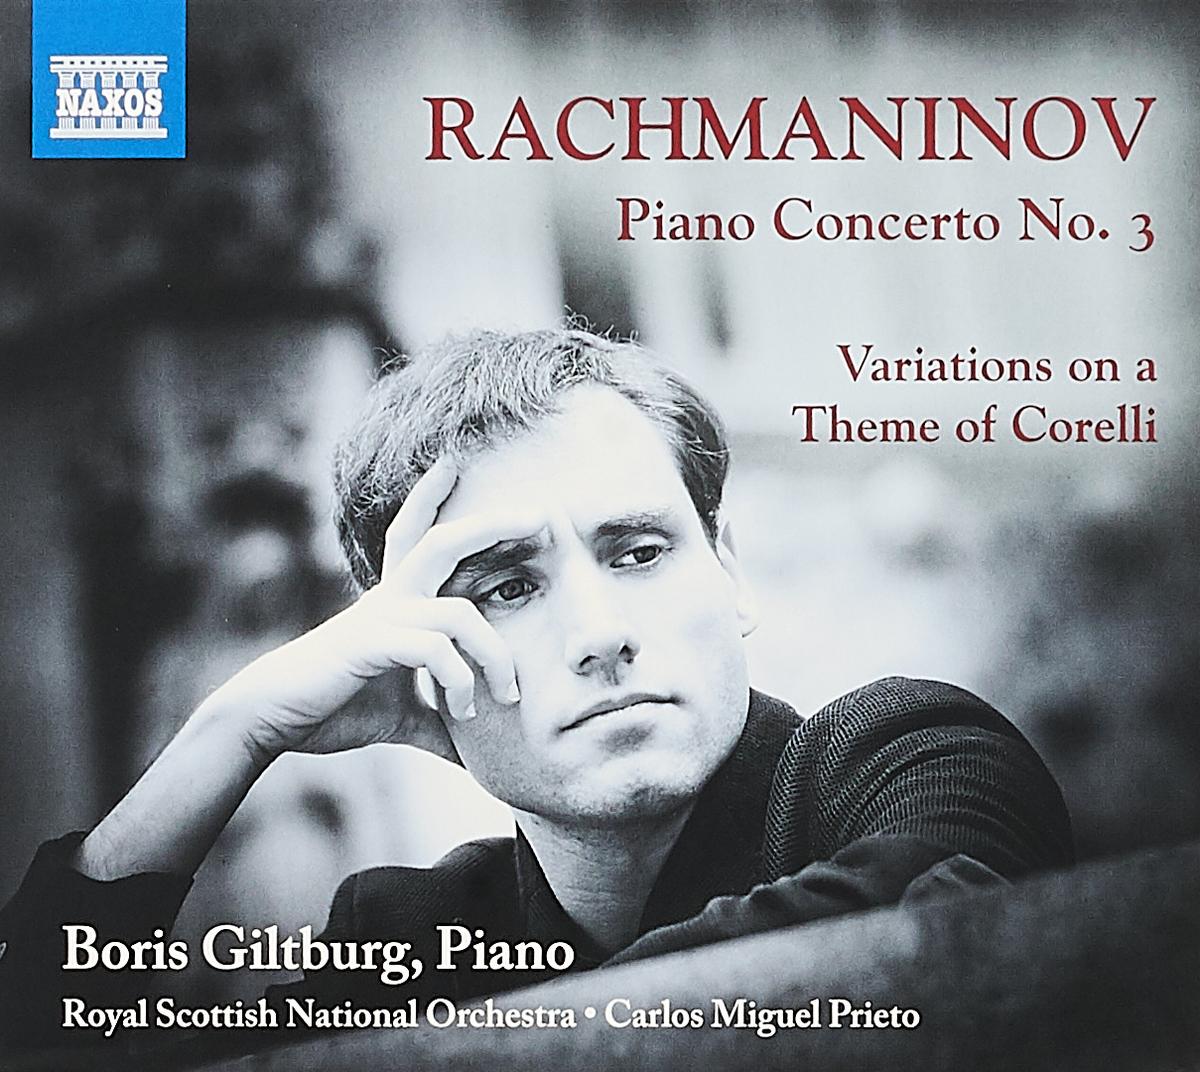 Boris Giltburg,Royal Scottish National Orchestra Boris Giltburg. Rachmaninoff: Piano Concerto No. 3, Variations on a Theme of Corelli, Op. 42 r kearns variation on a theme by corelli